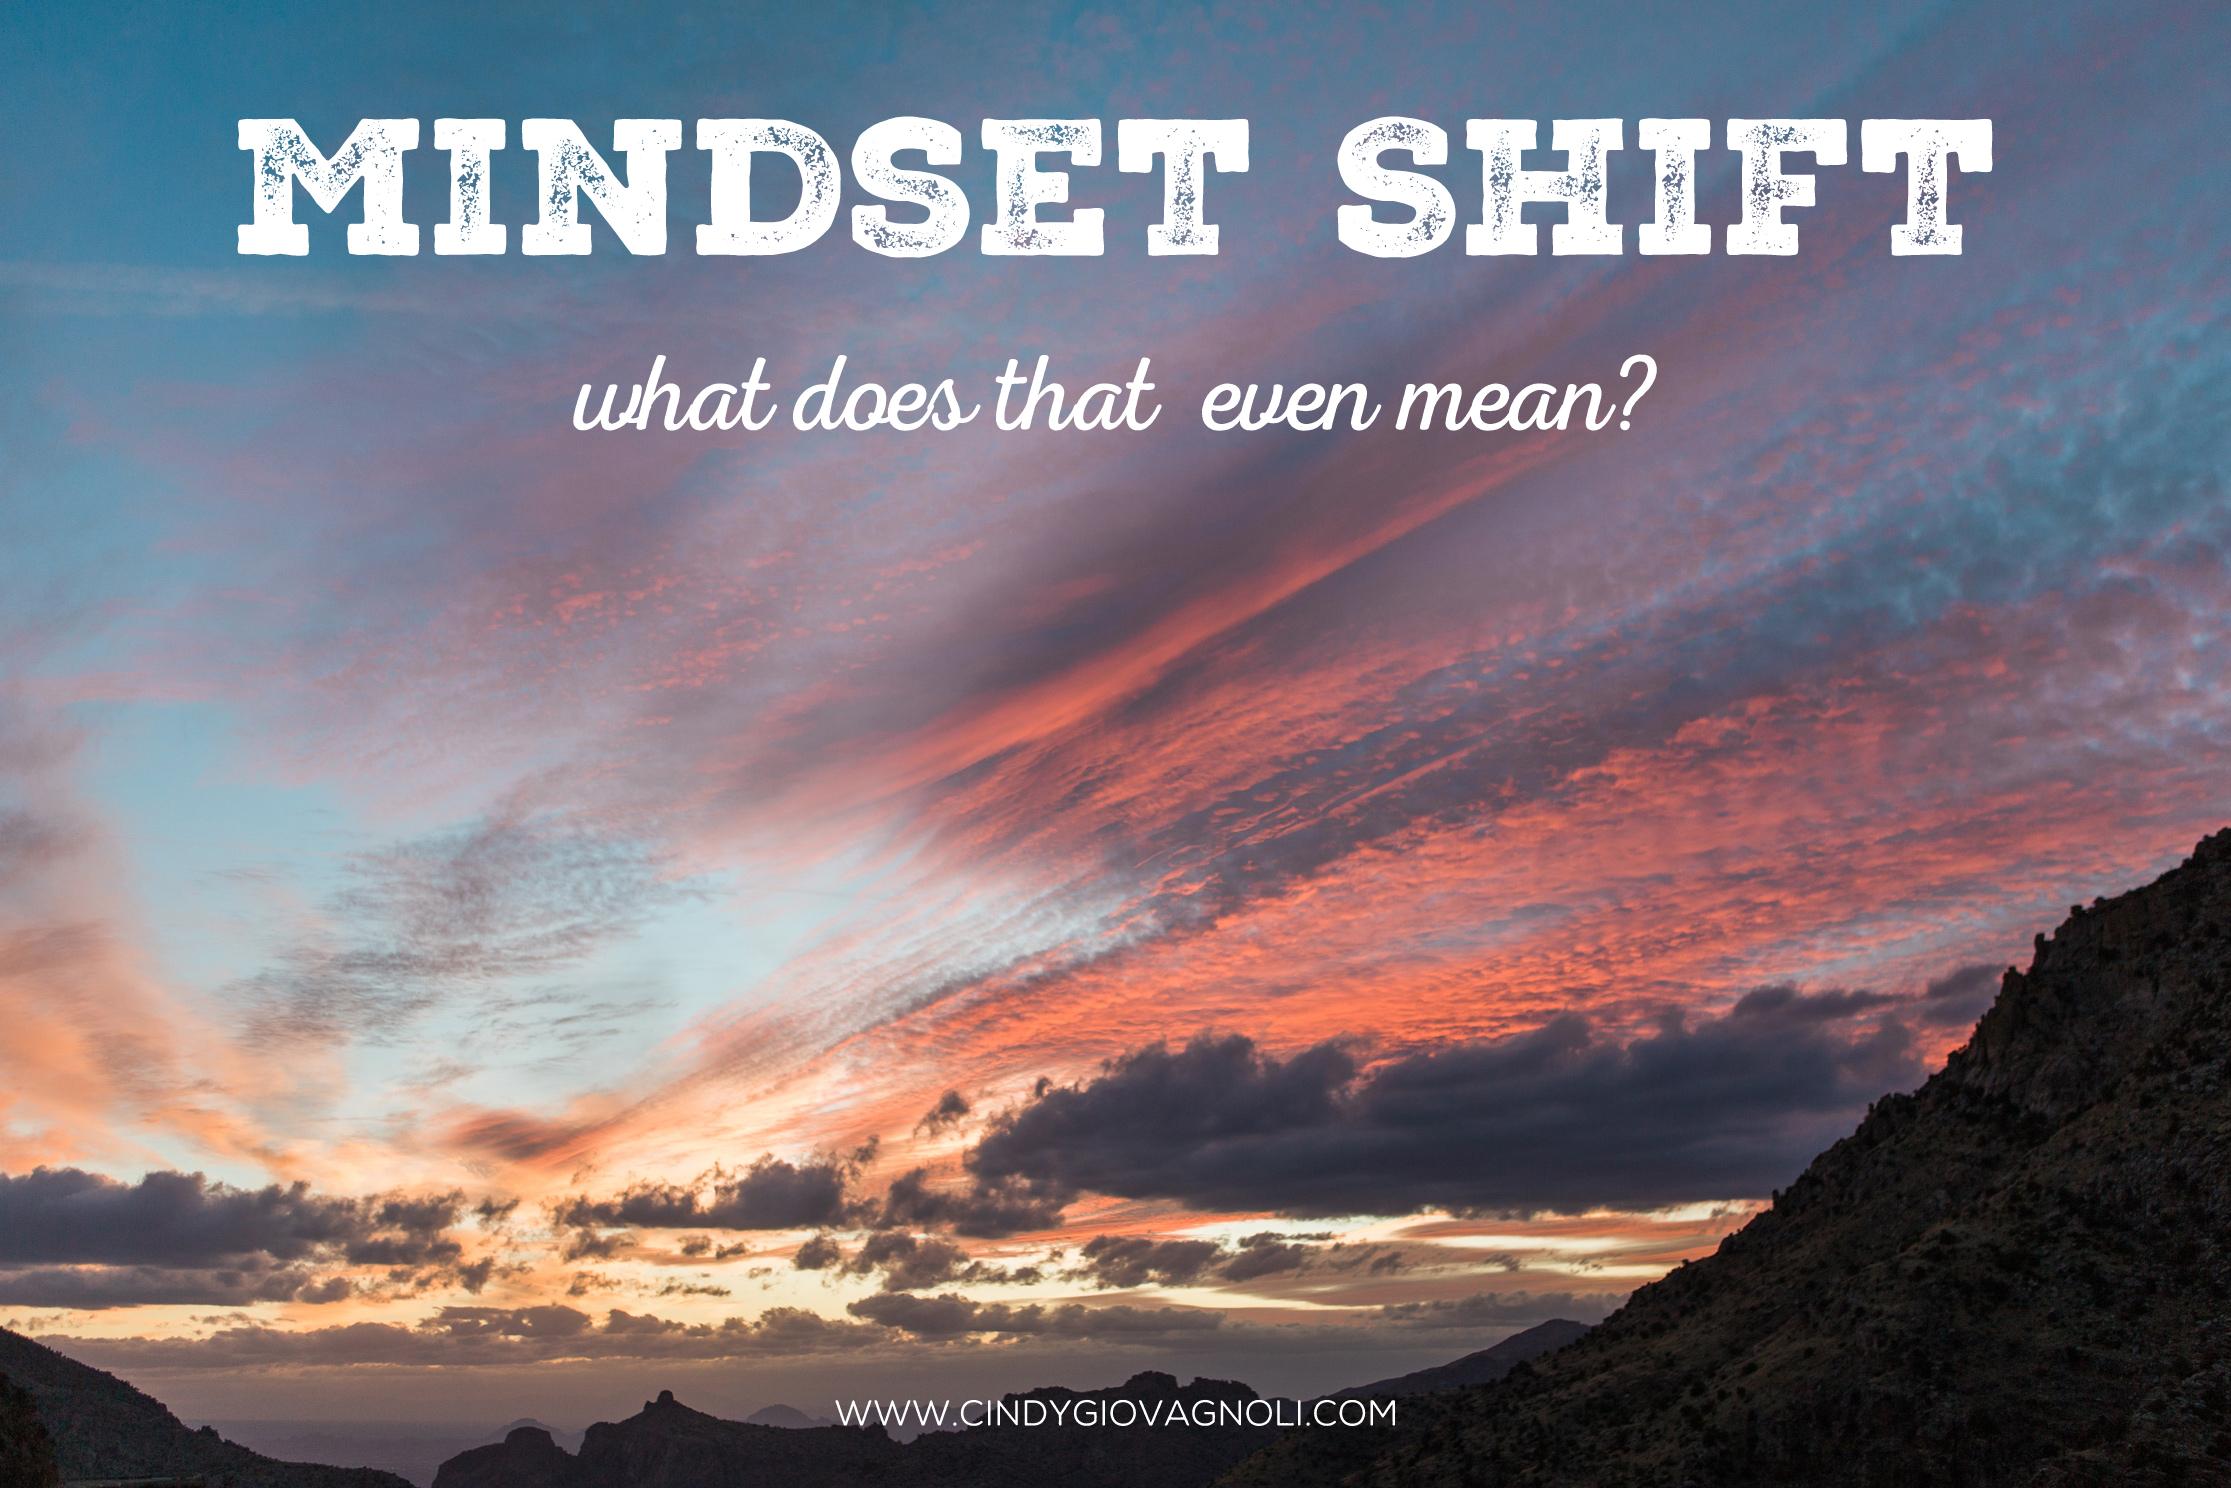 CindyGiovagnoli_mindset_7-10-19.jpg